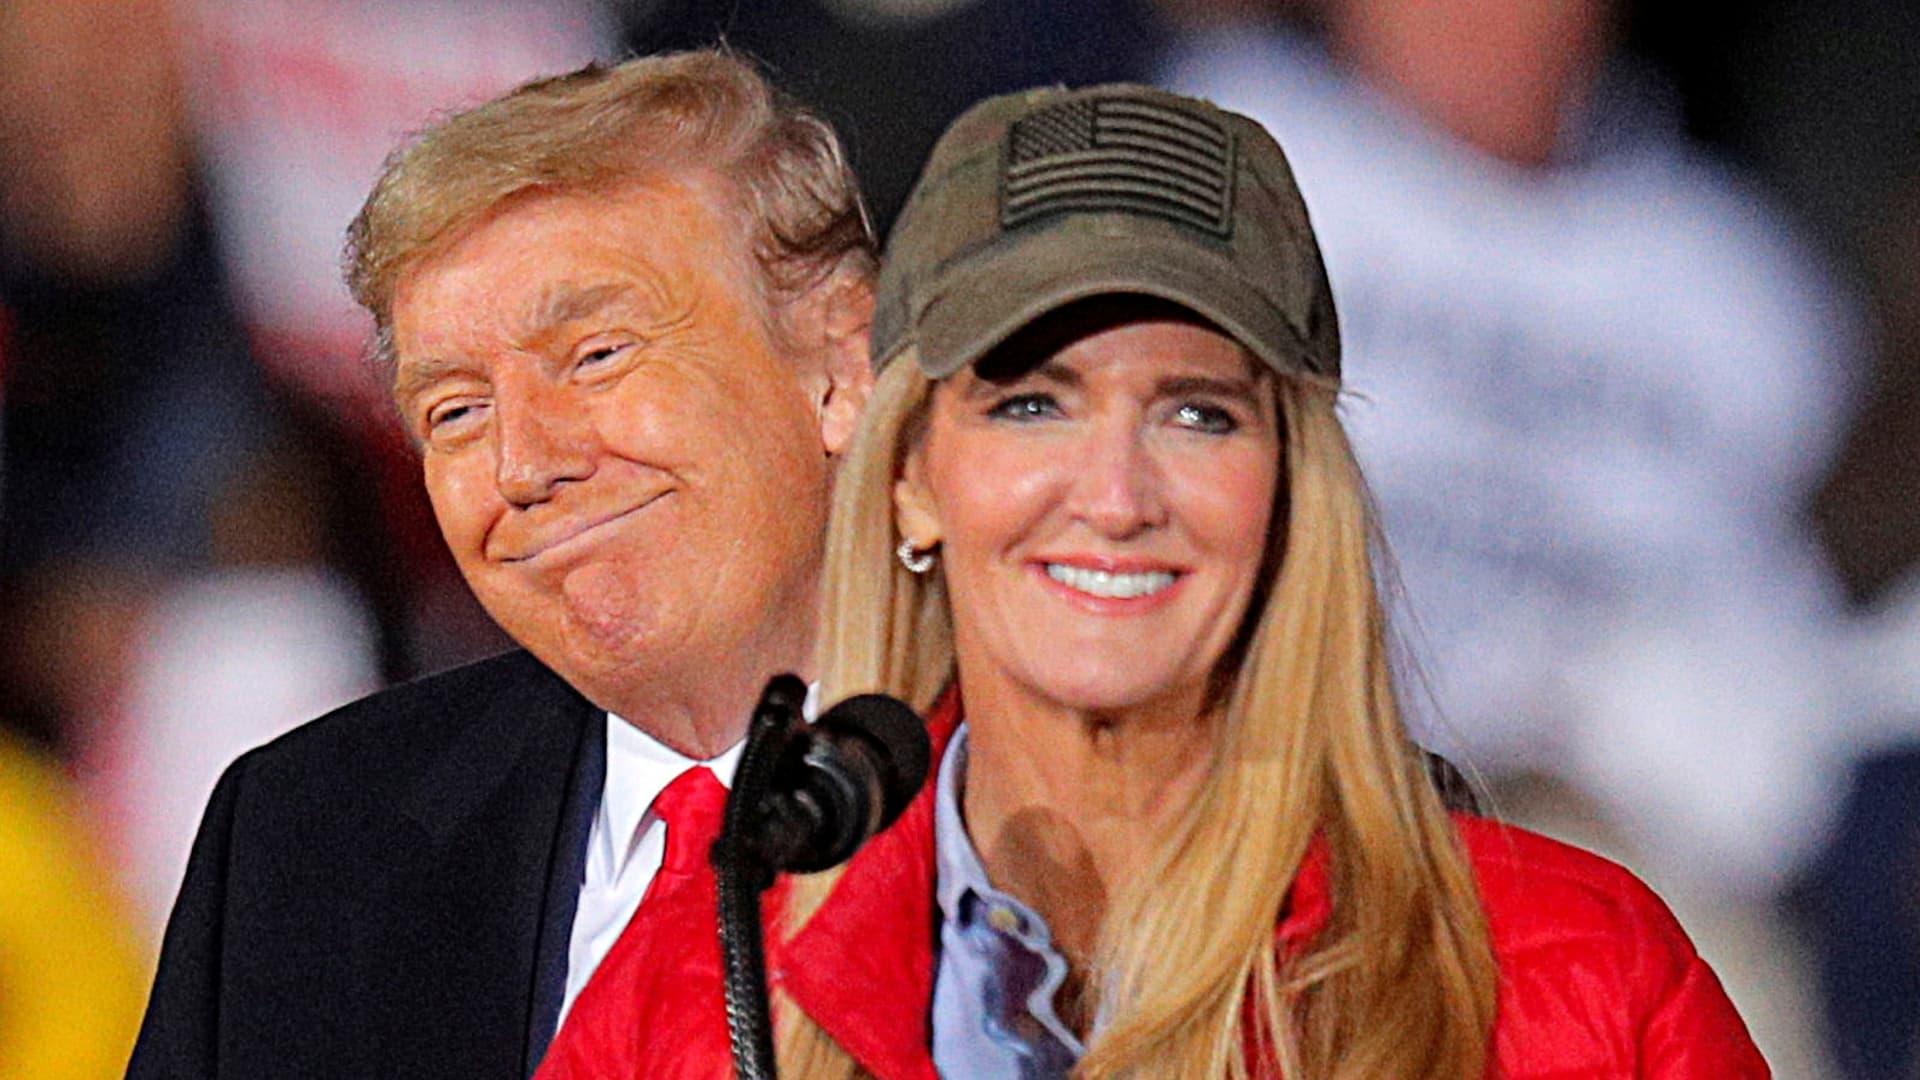 U.S. President Donald Trump campaigns with Republican Senator Kelly Loeffler on the eve of the run-off election to decide both of Georgia's Senate seats, in Dalton, Georgia, U.S., January 4, 2021.